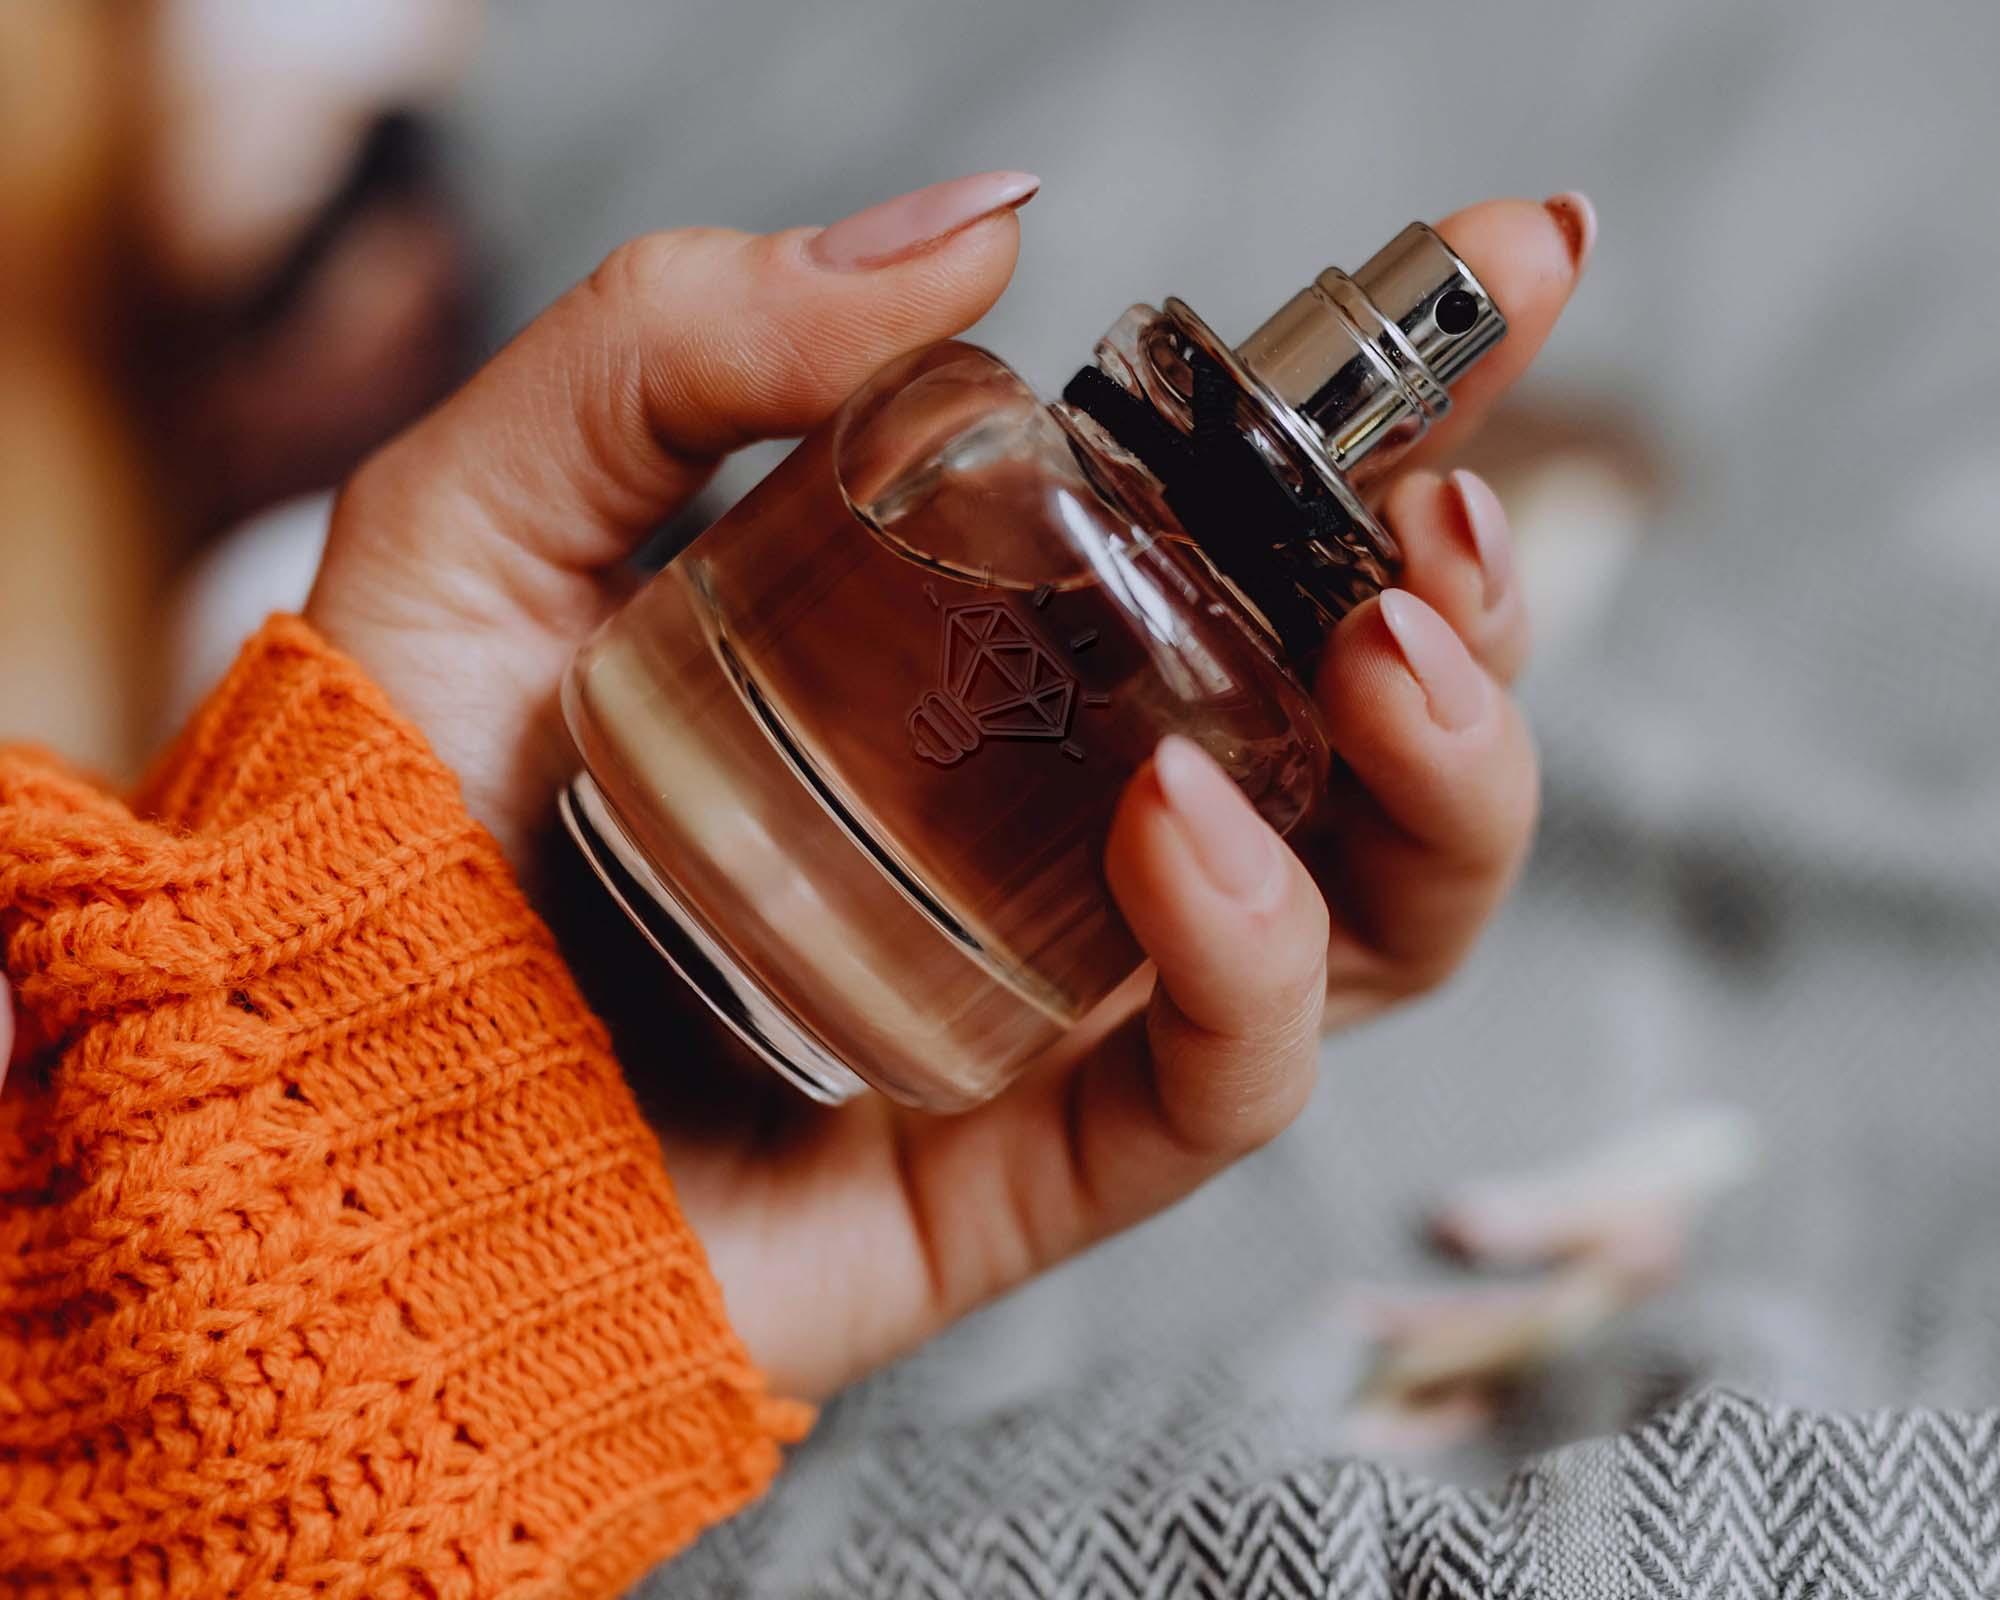 Perfume Held by a Hand Mockup 2